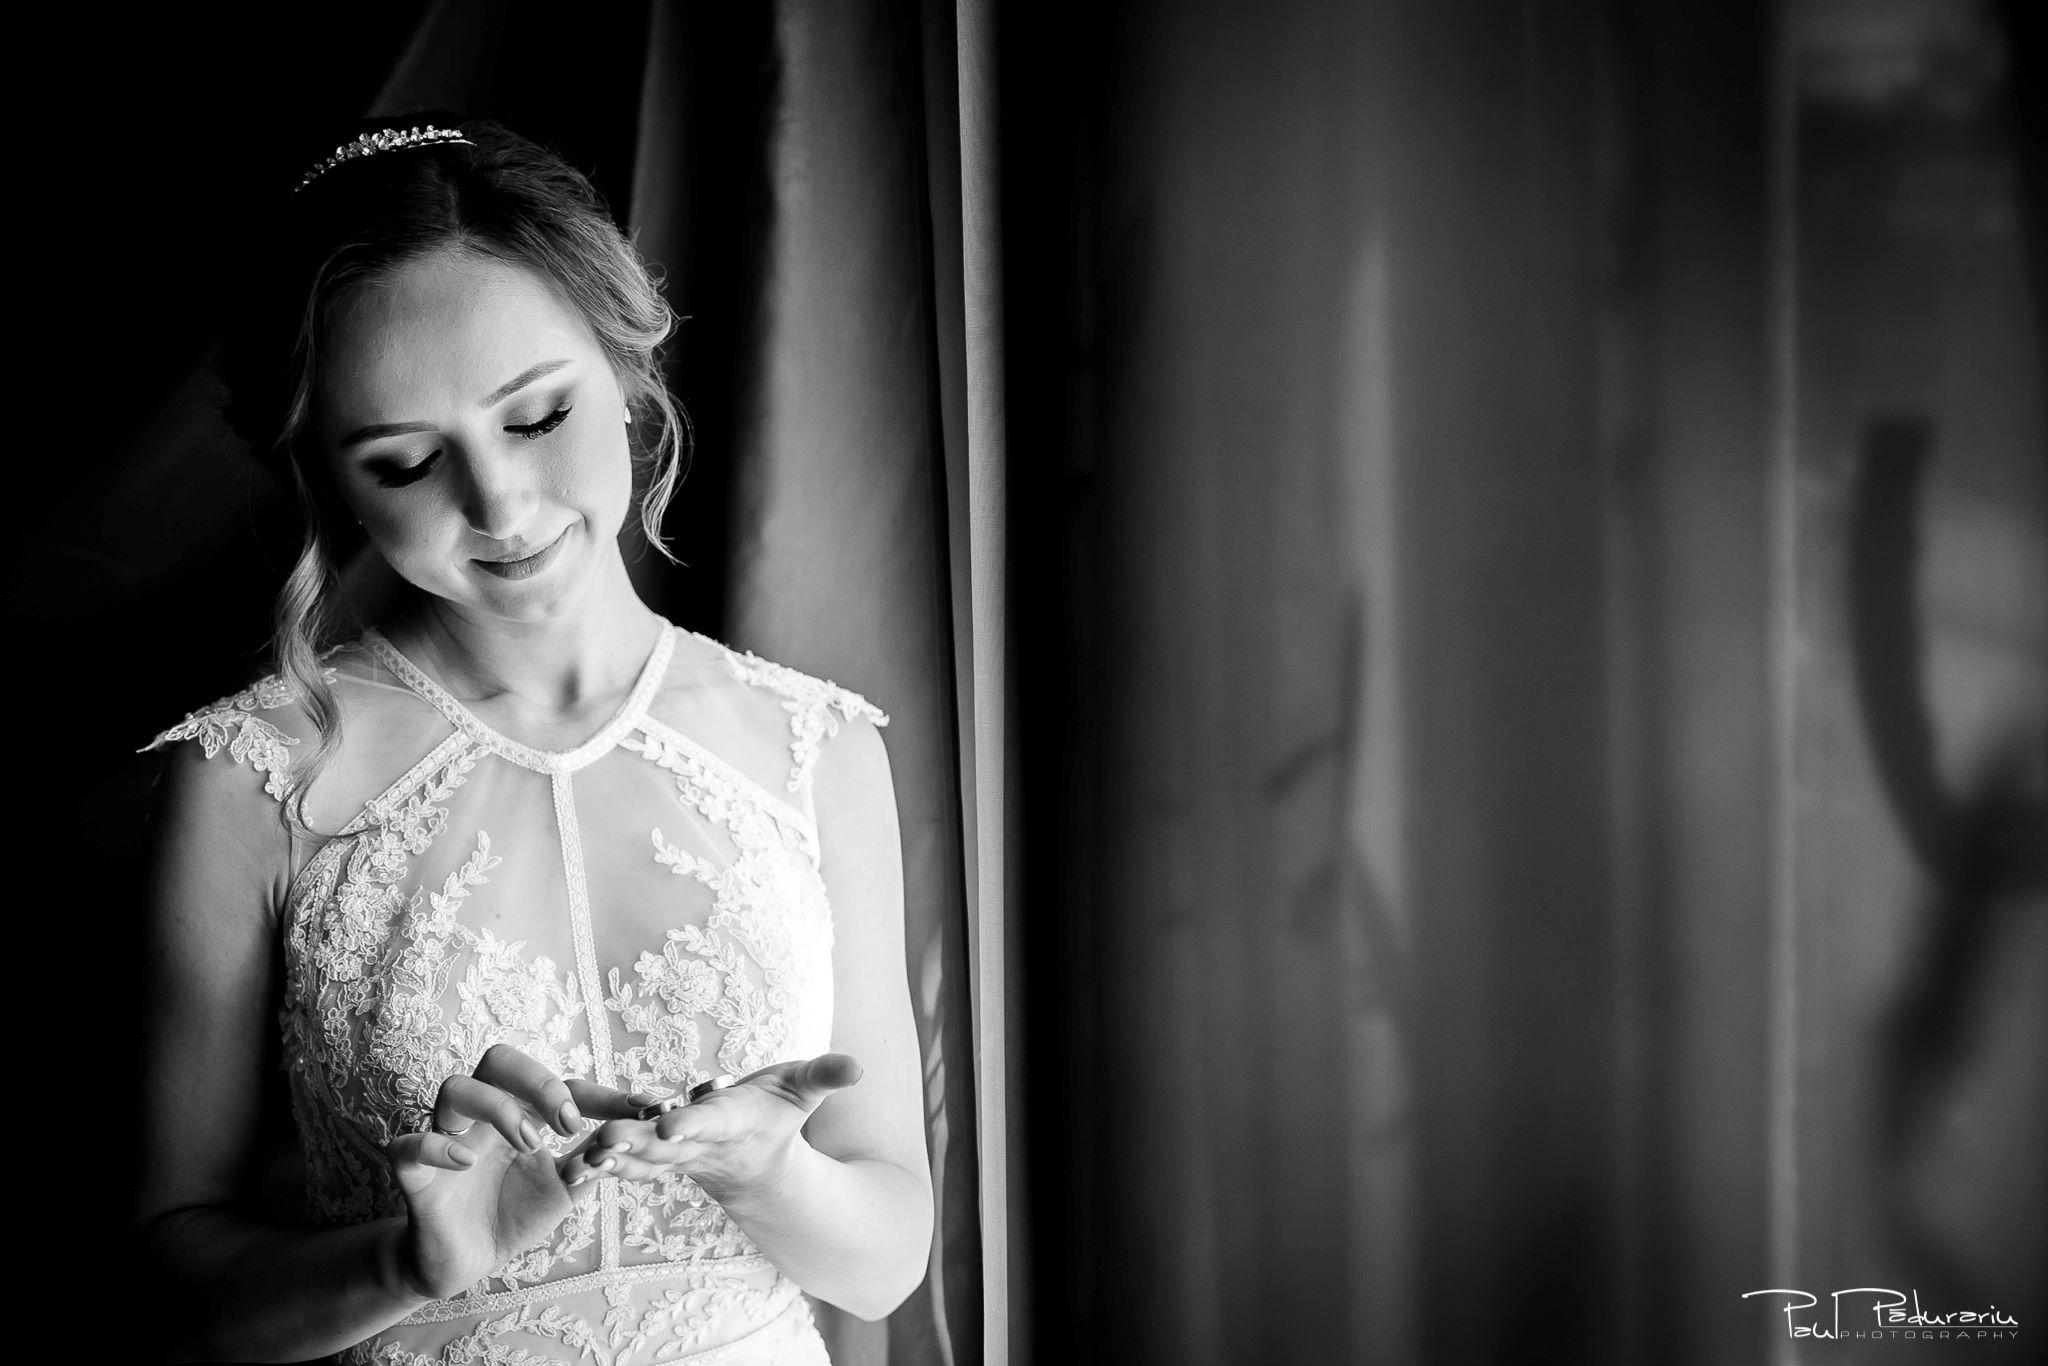 Nicoleta si Catalin nunta Iasi fotograf profesionist Paul Padurariu 2018 7